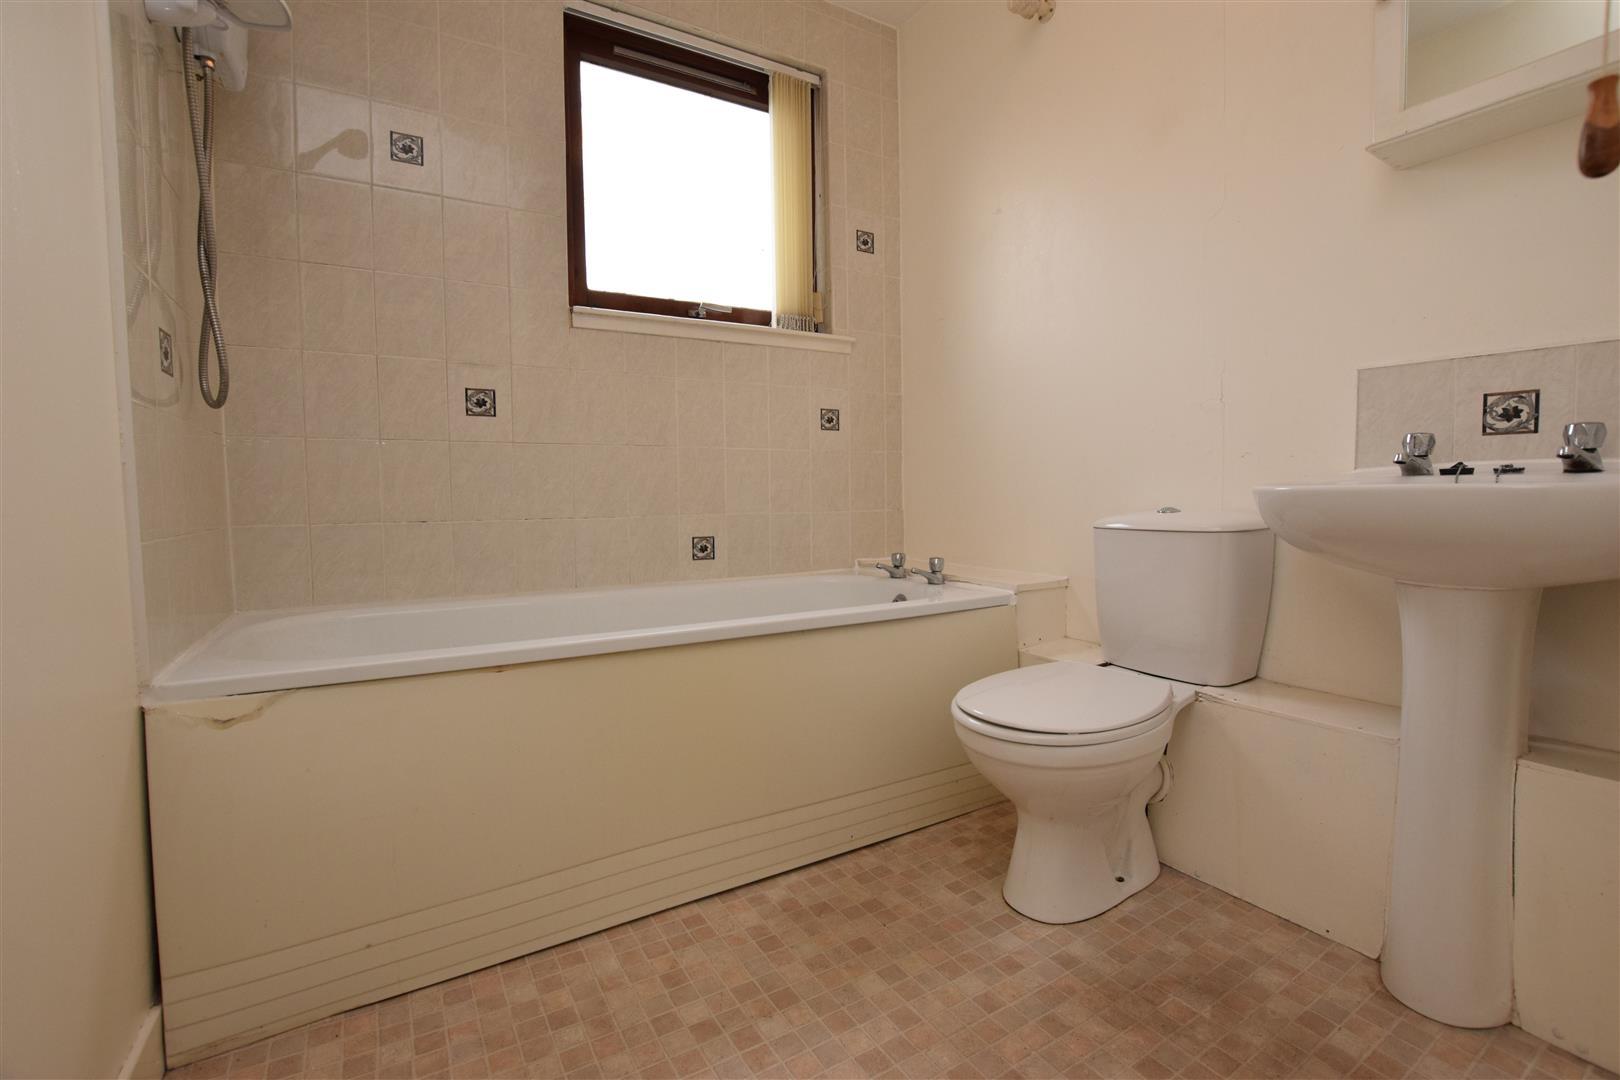 2, Drumhar Court, Perth, Perthshire, PH1 5SG, UK